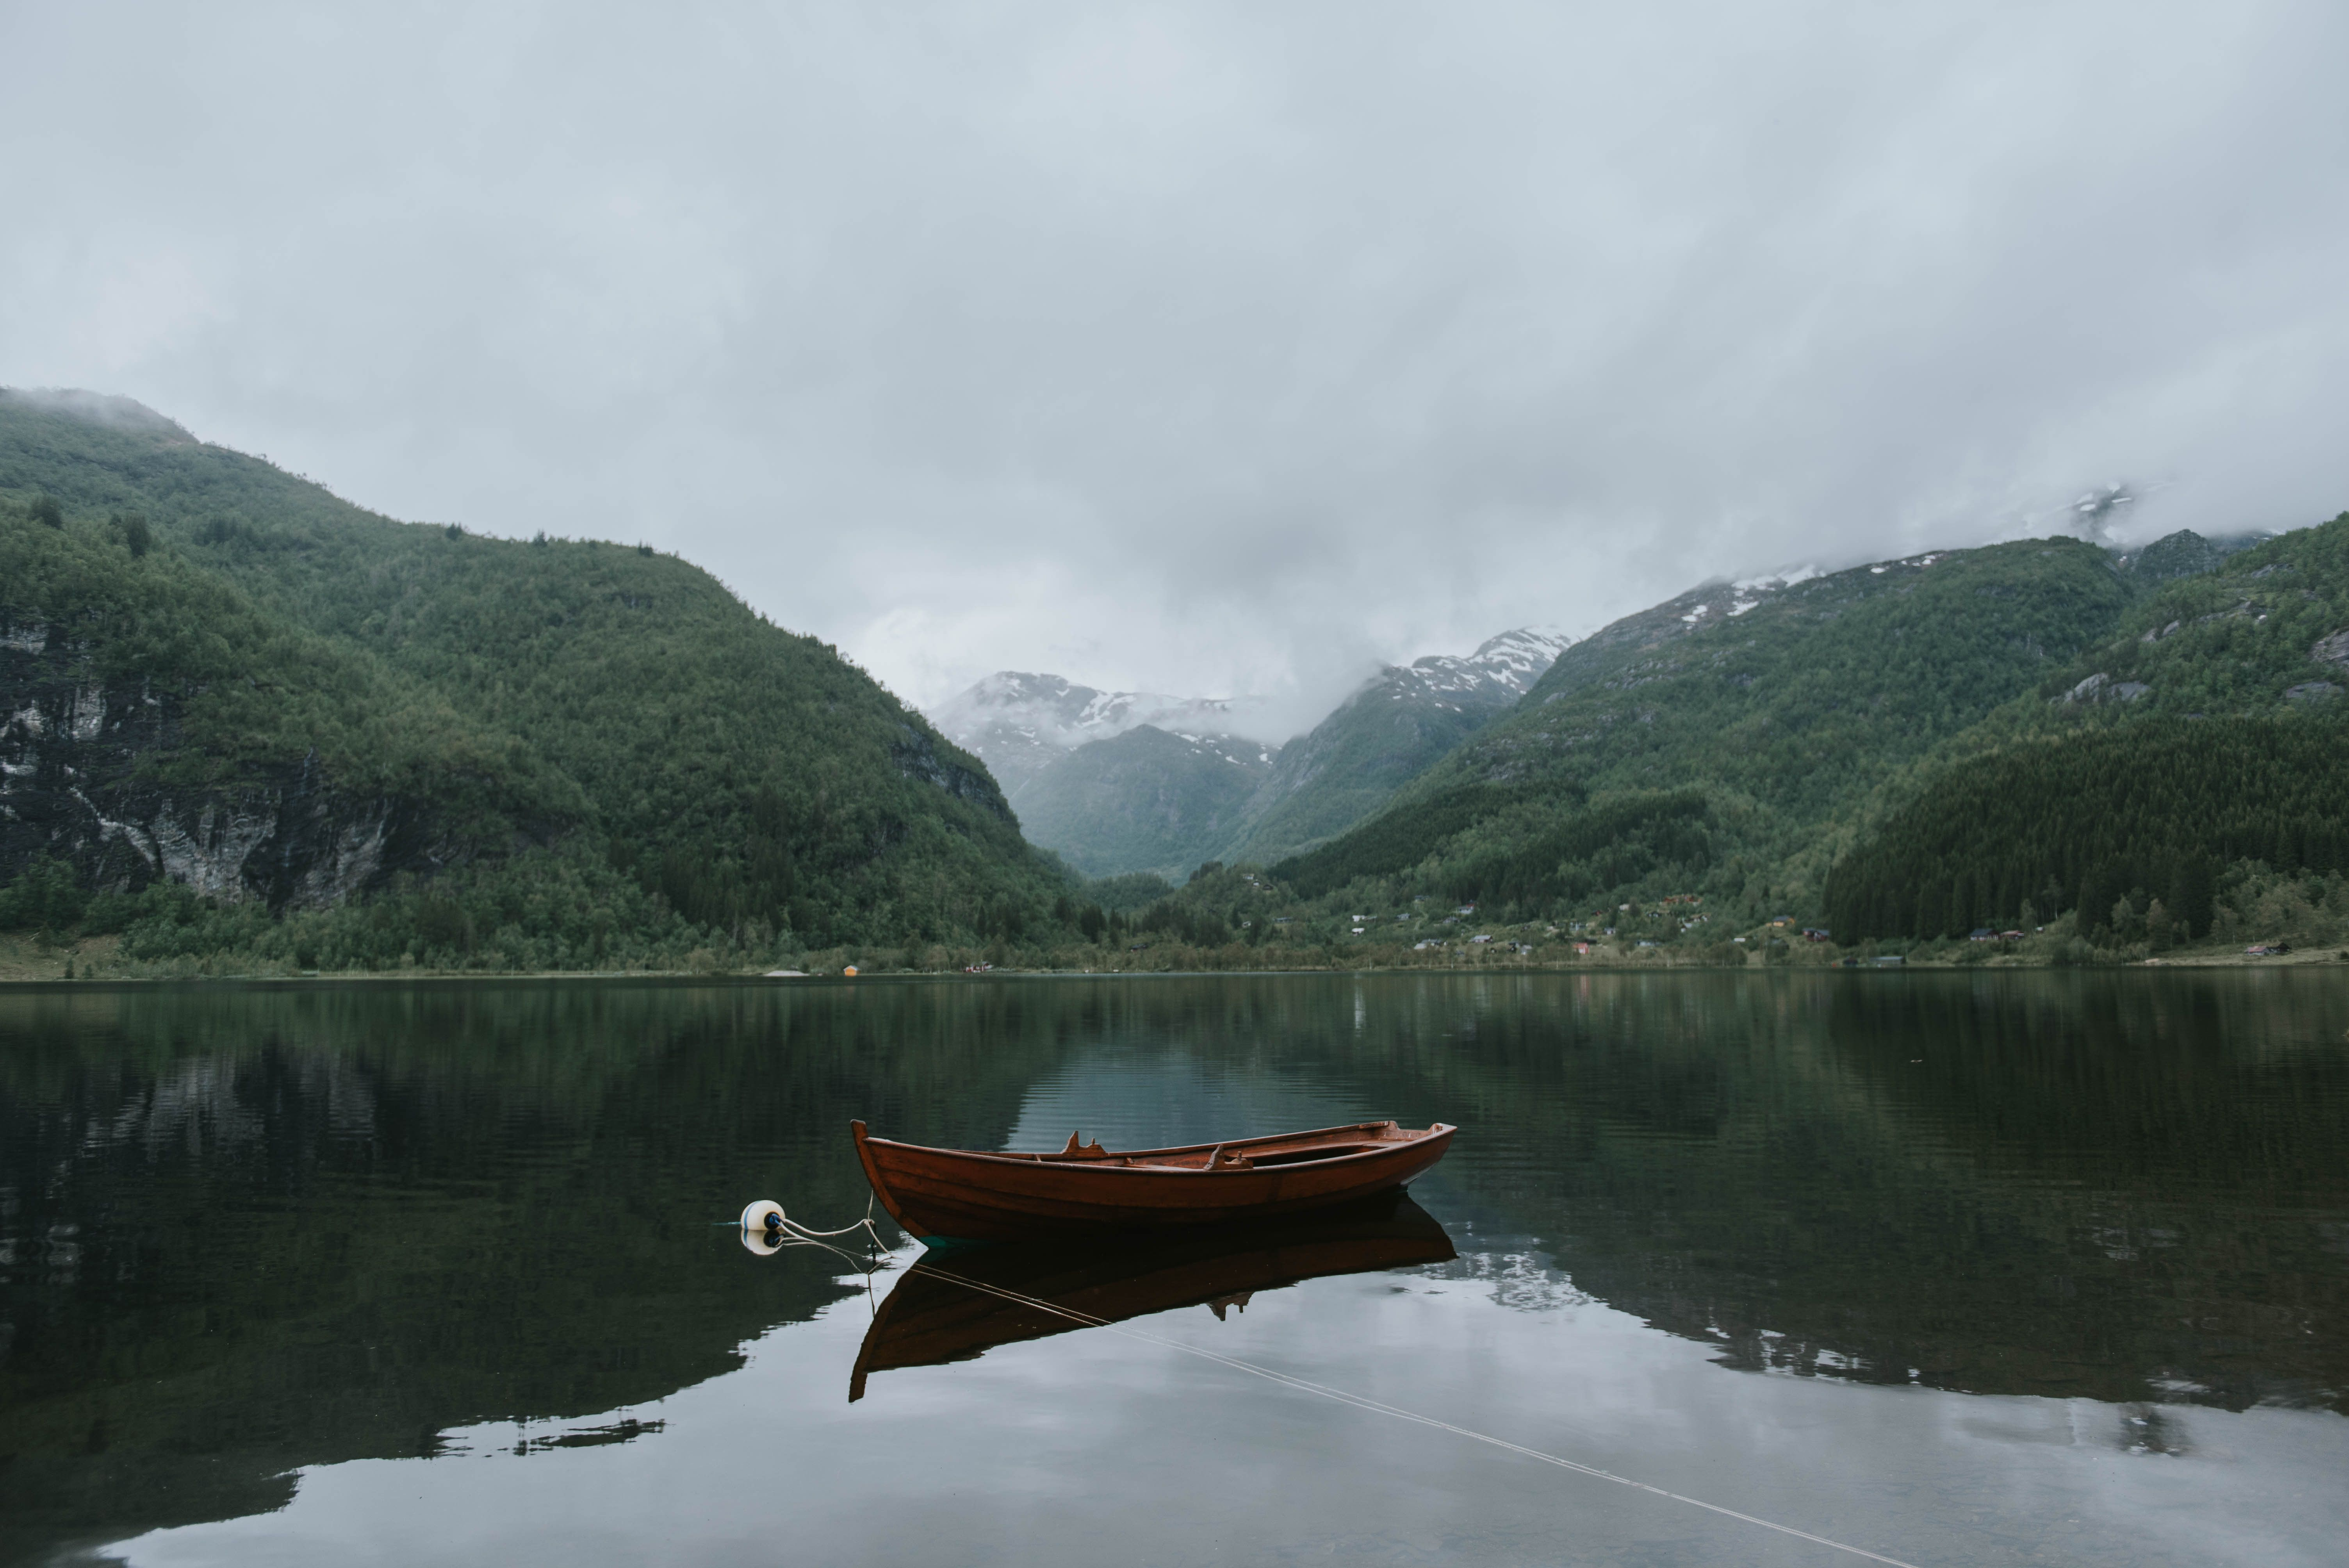 Free Photos Boat Mountain Canoe Norway Scenic Lakes National Parks Lake Photos